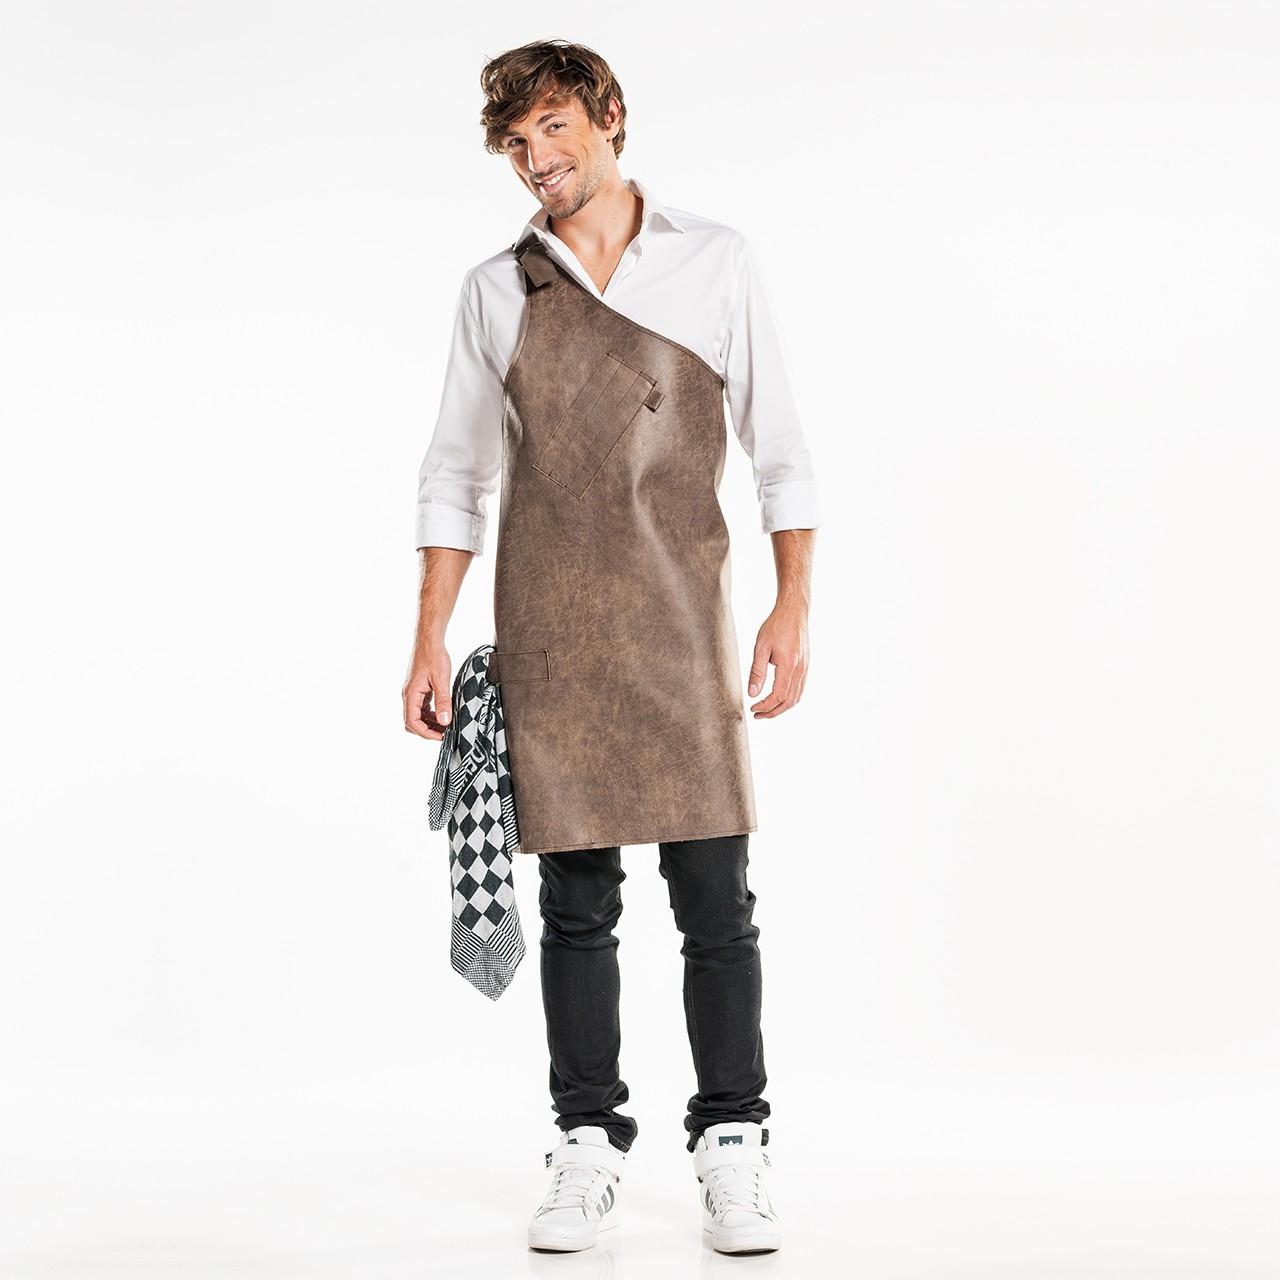 Leder Latzschürze Butcher Chaud Devant® | bedrucken, besticken, bedrucken lassen, besticken lassen, mit Logo |